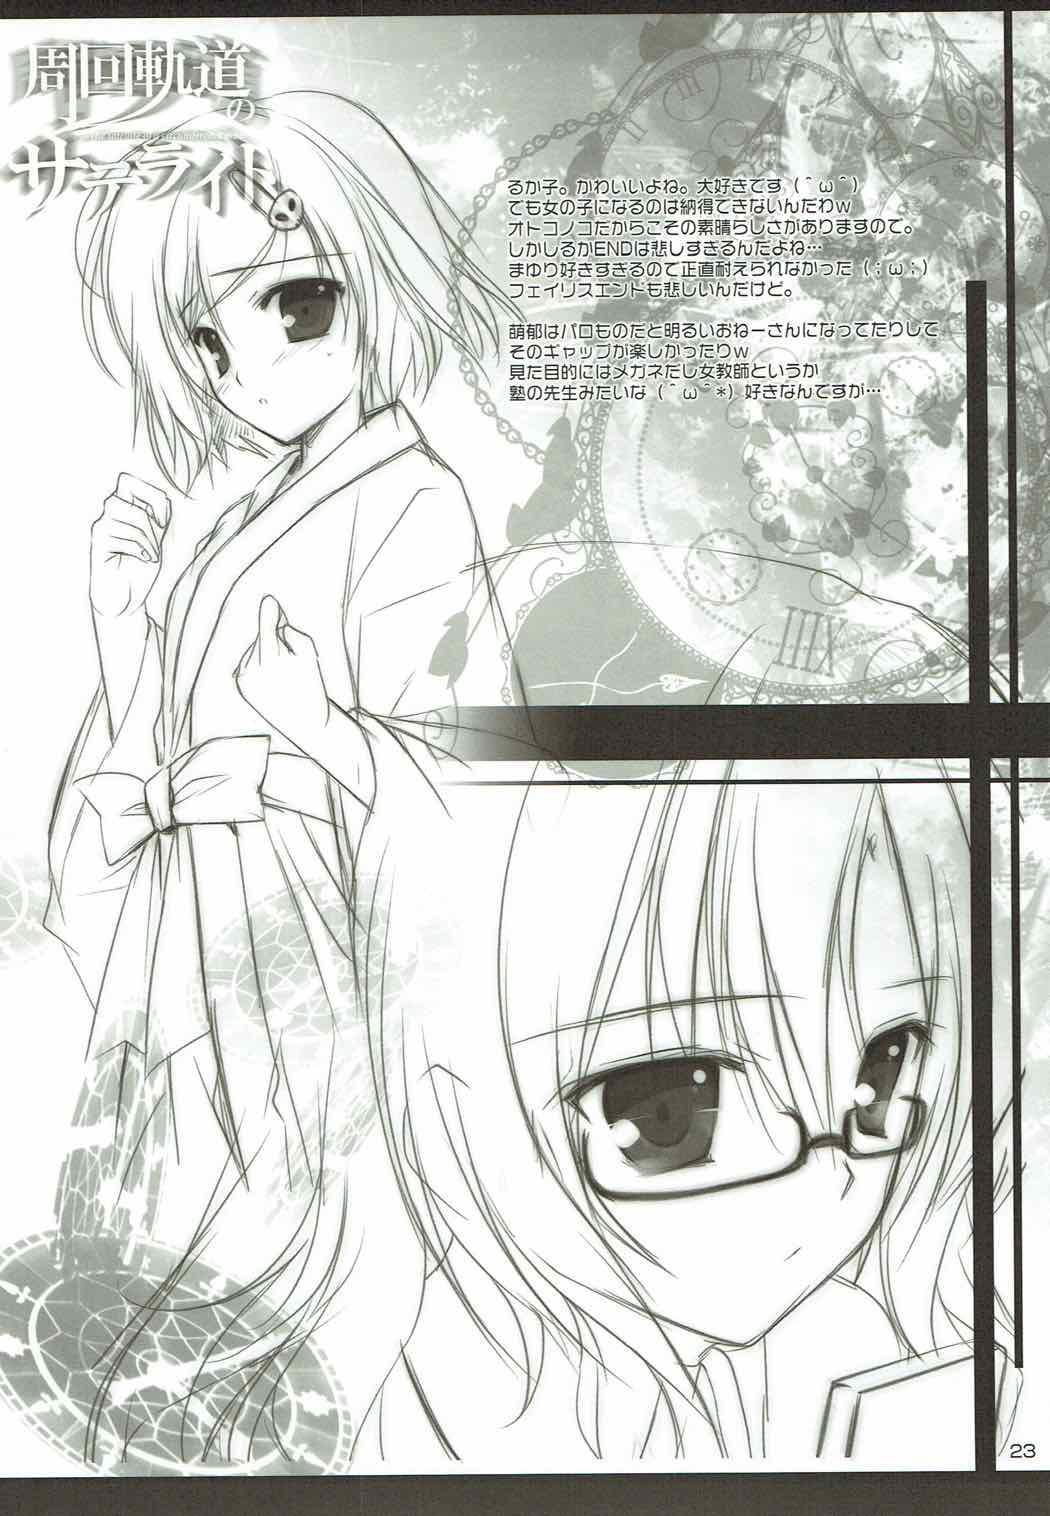 Shuukai Kidou no Satellite 21